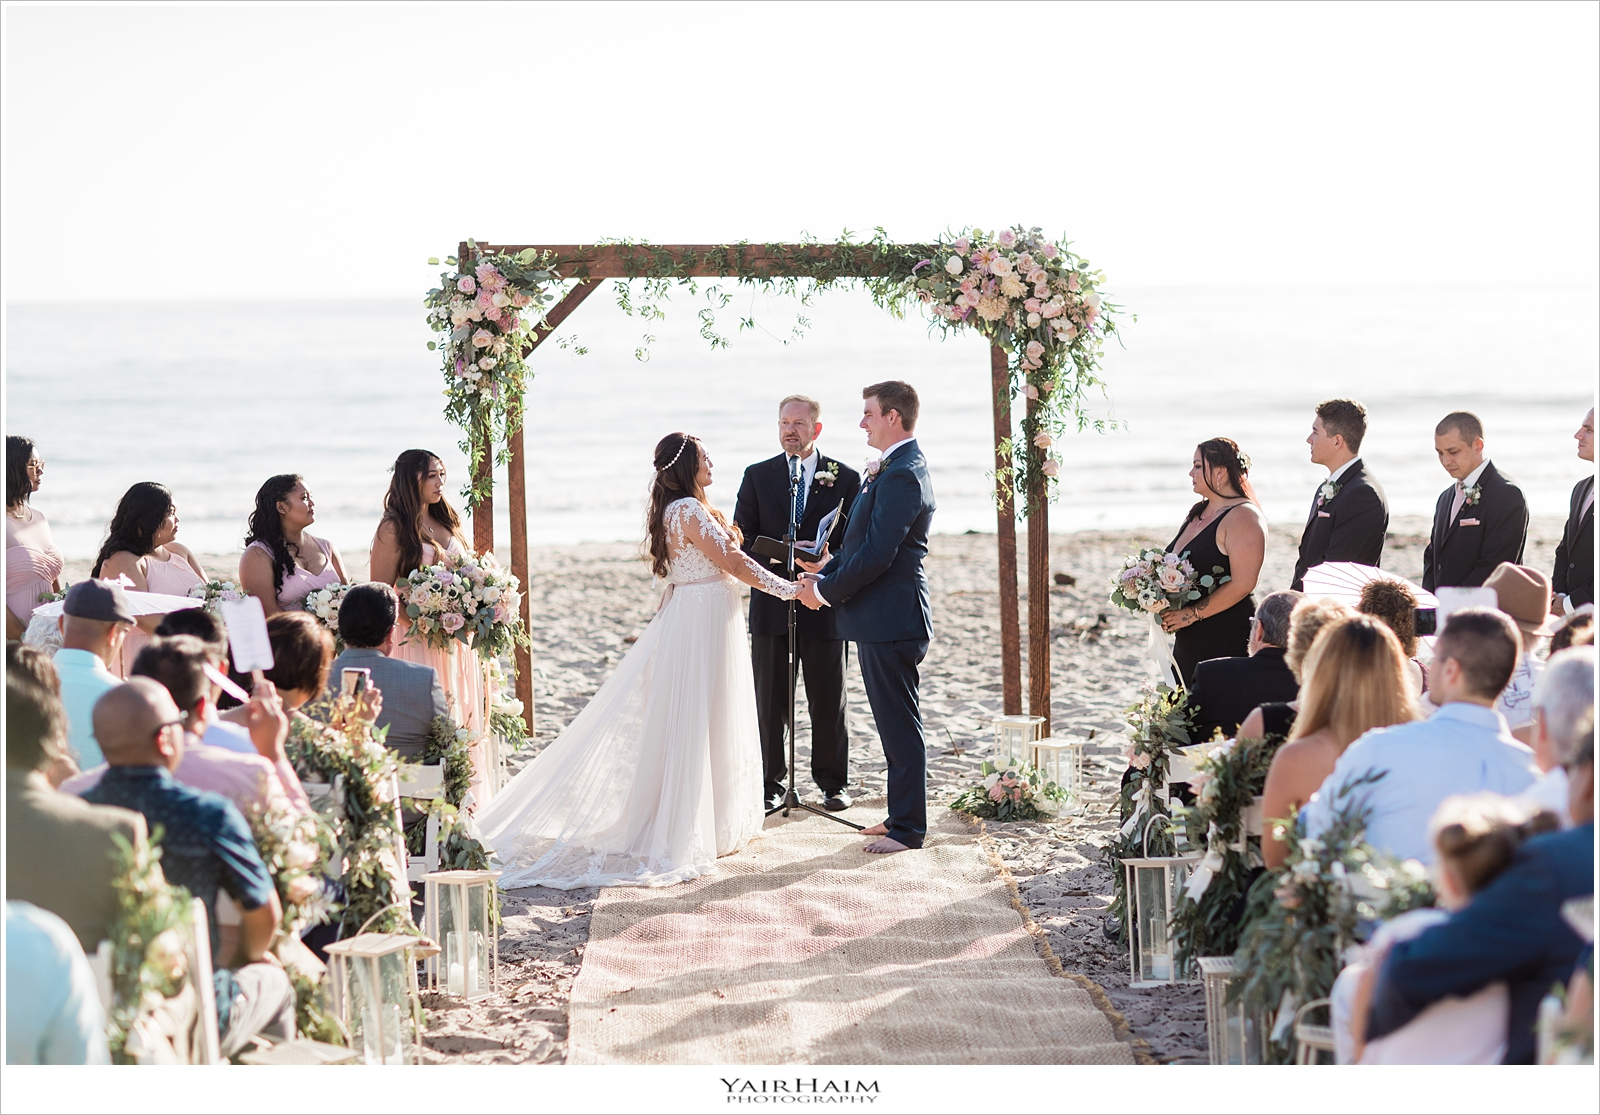 Chrystle-Robbie-wedding-photos-570.JPG